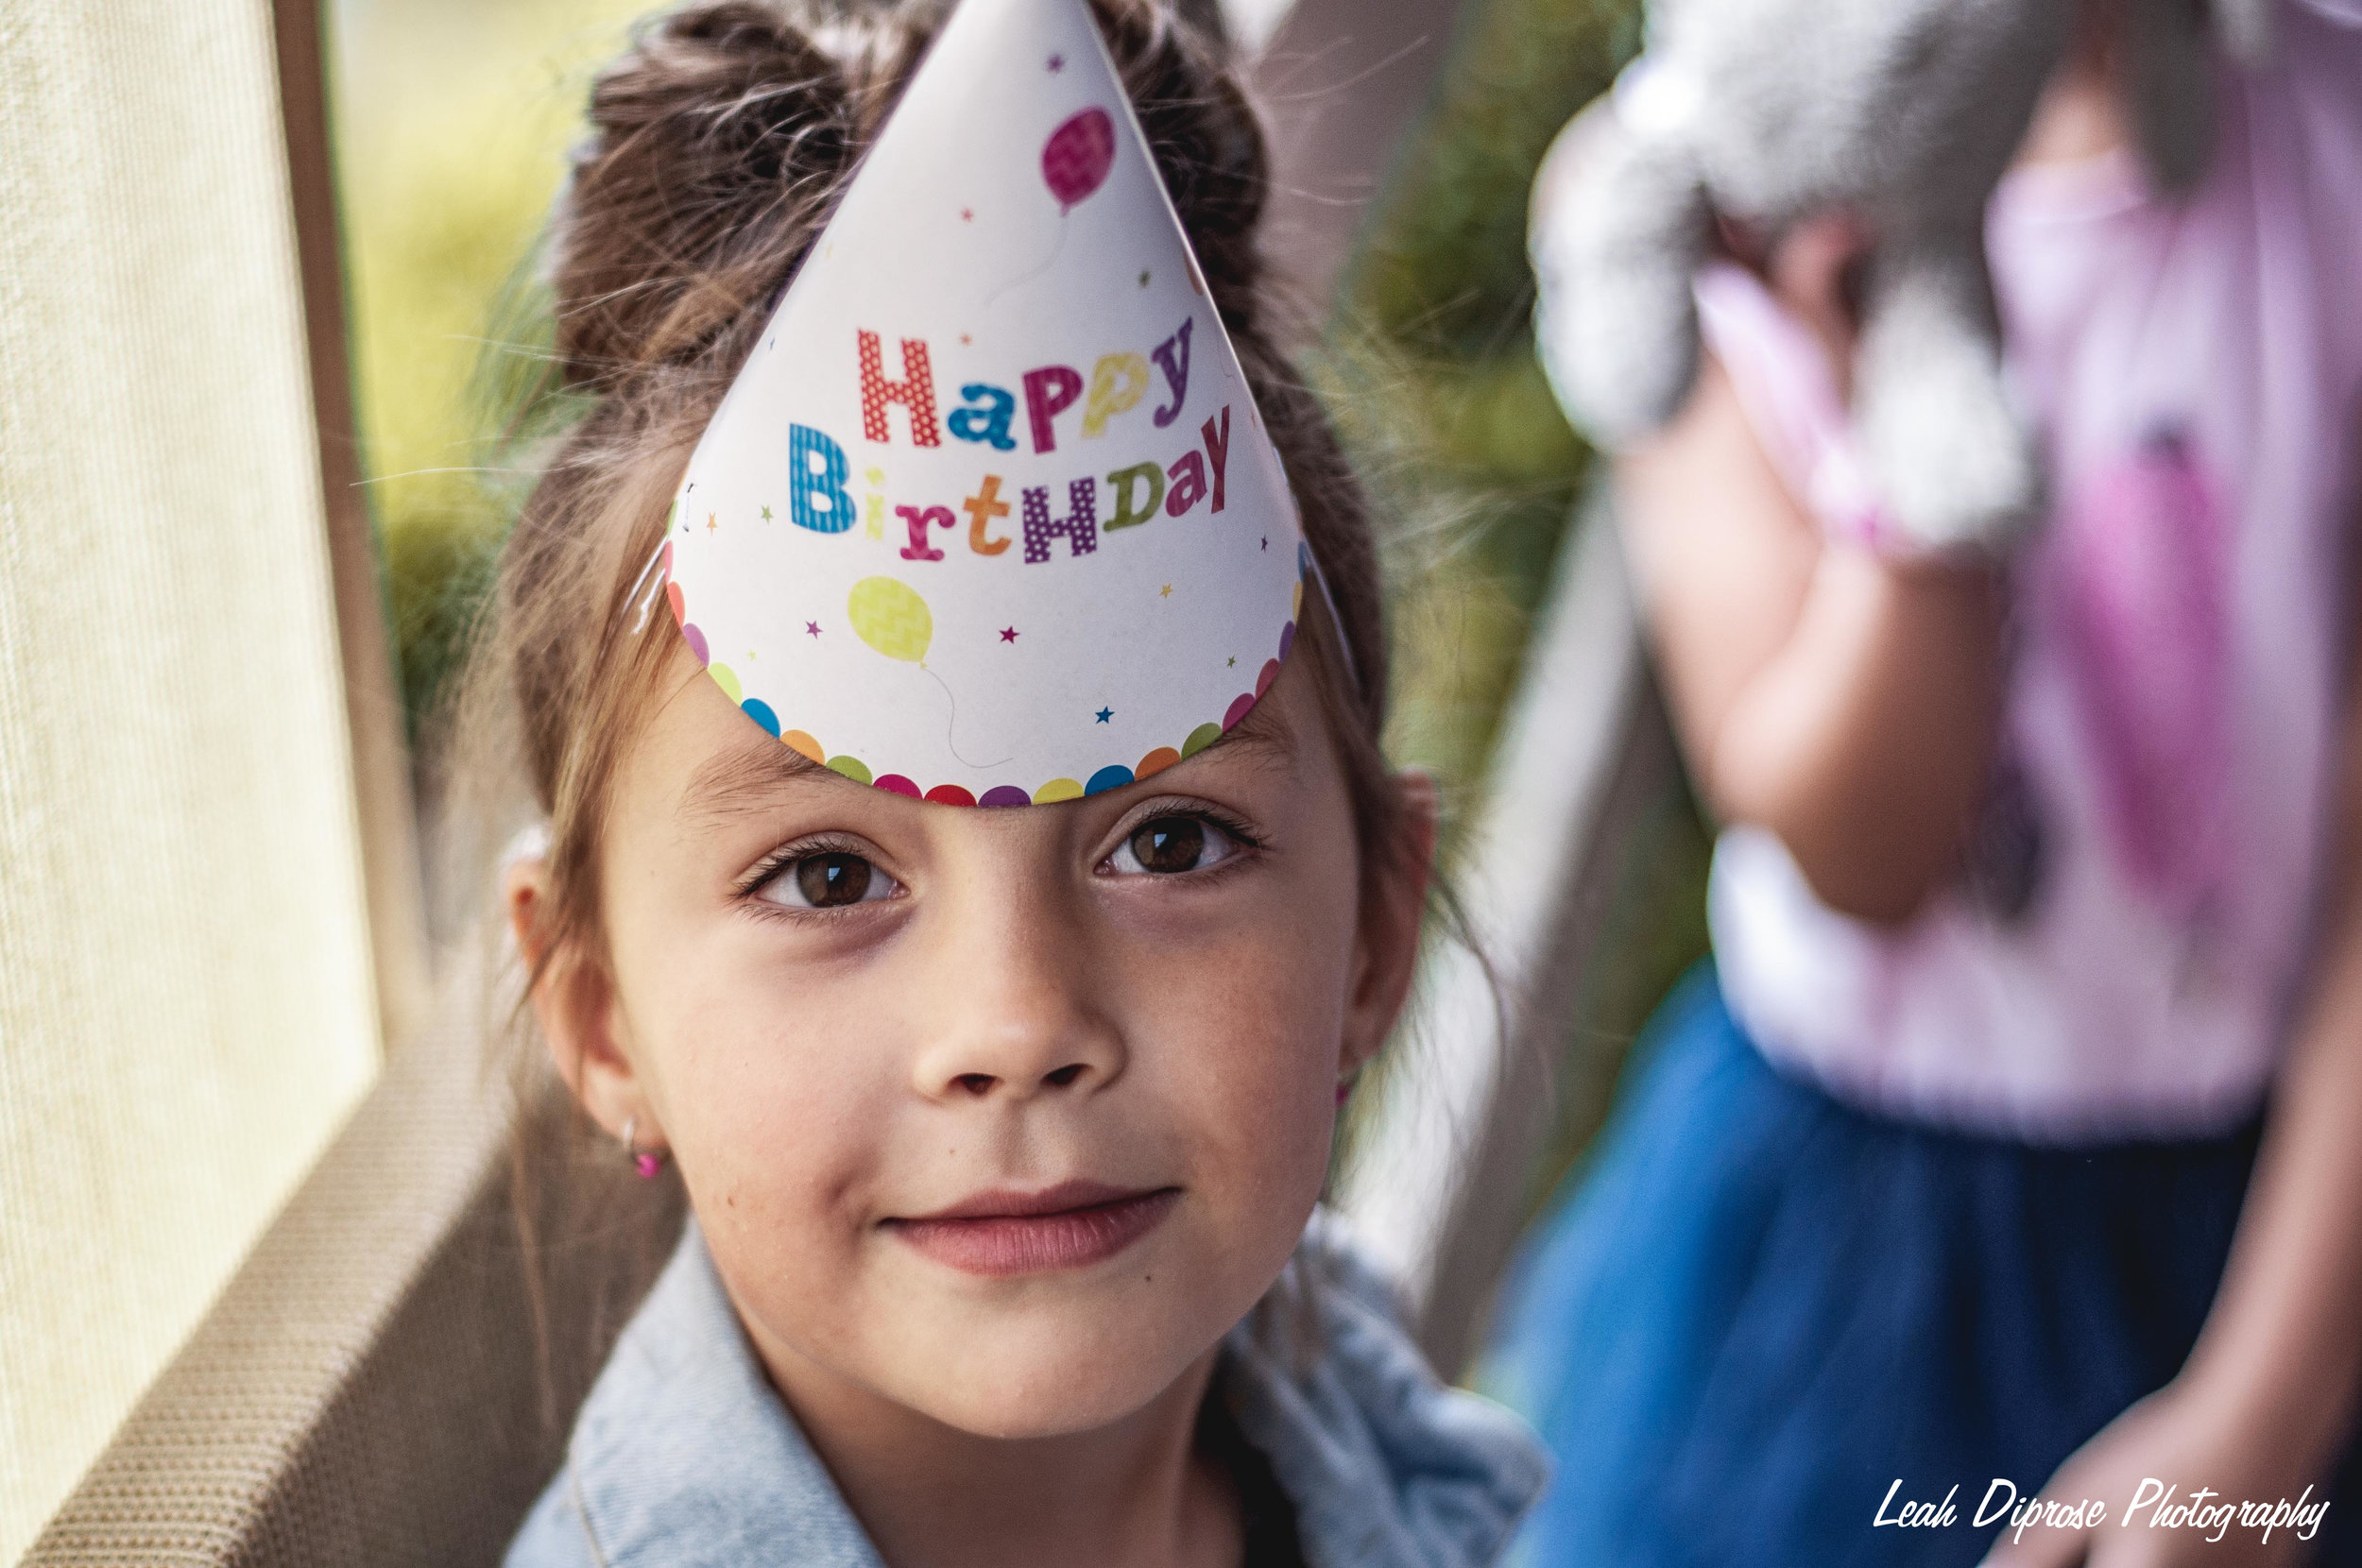 Leah Diprose Photography image-6751.jpg